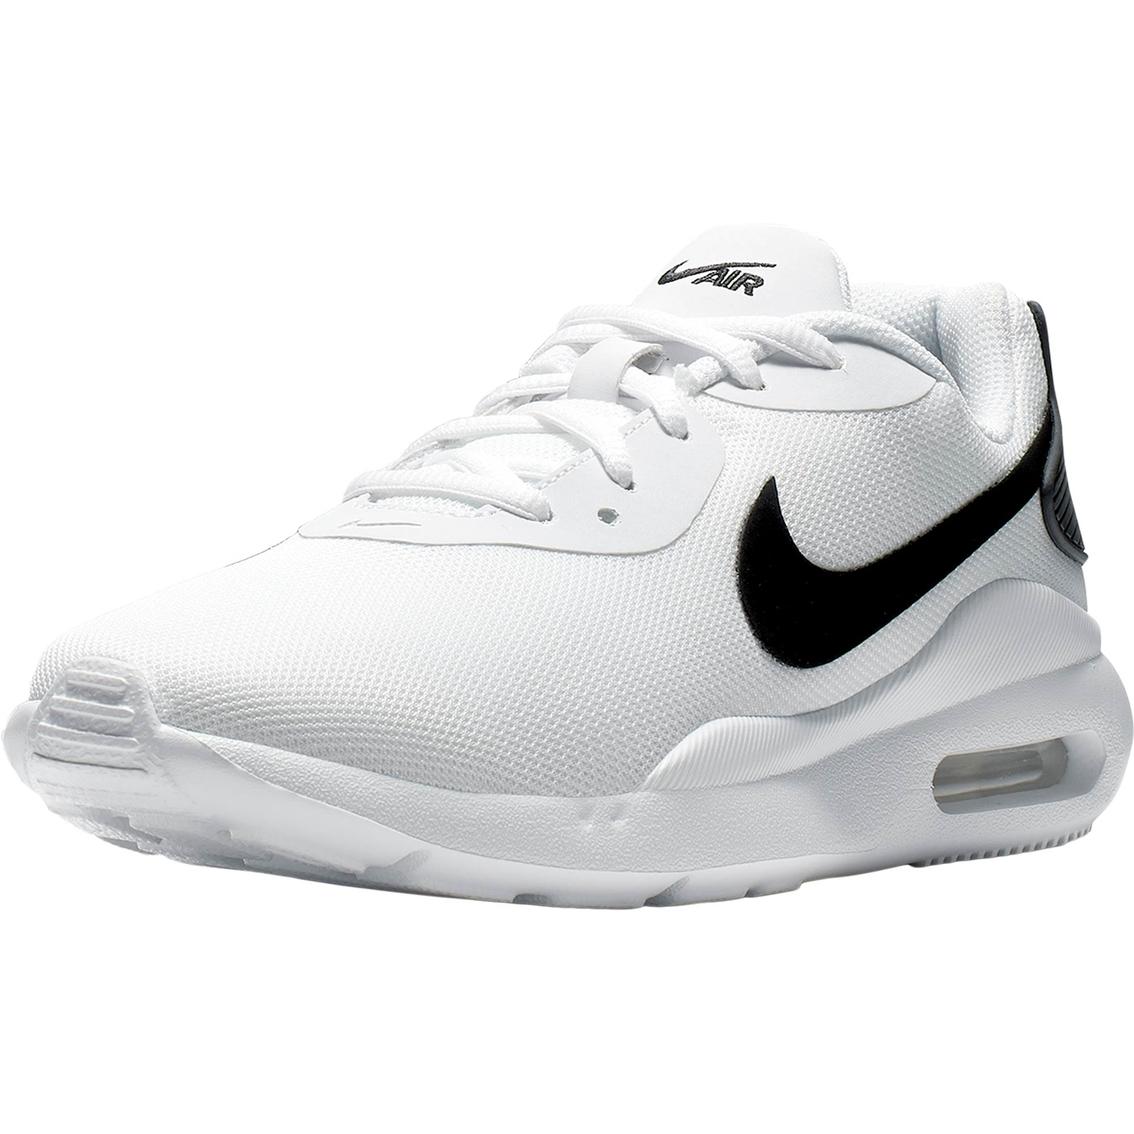 Nike Women's Air Max Oketo Running Shoes | Running | Shoes